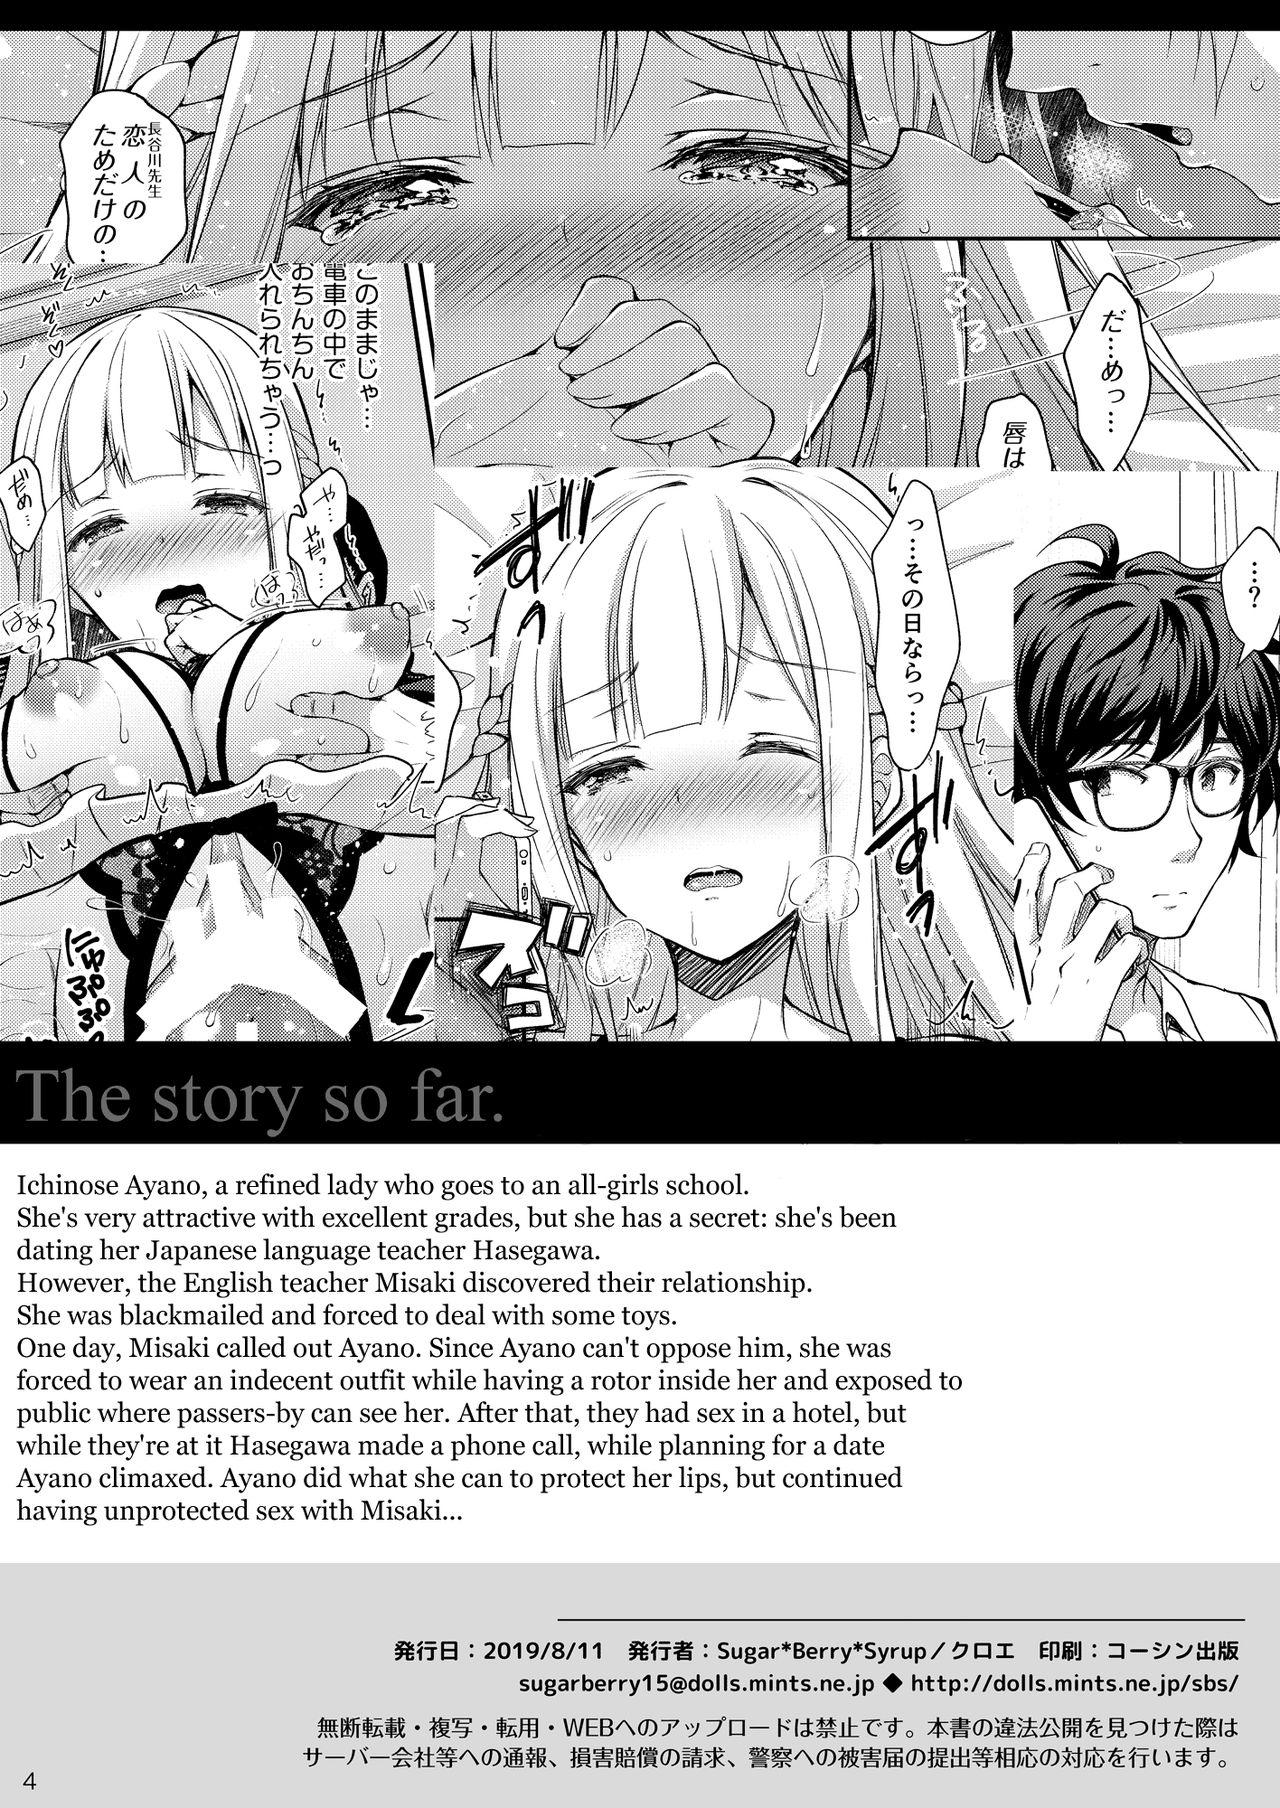 (C96) [Sugar*Berry*Syrup (Crowe)] Indeki no Reijou 3 ~Yureugoku Kokoro, Yoru Midareru Mitsubana~ | Obscene Lady 3 - ~Wavering heart, Astrayed Evening Nectar~ [English] [obsoletezero] 3